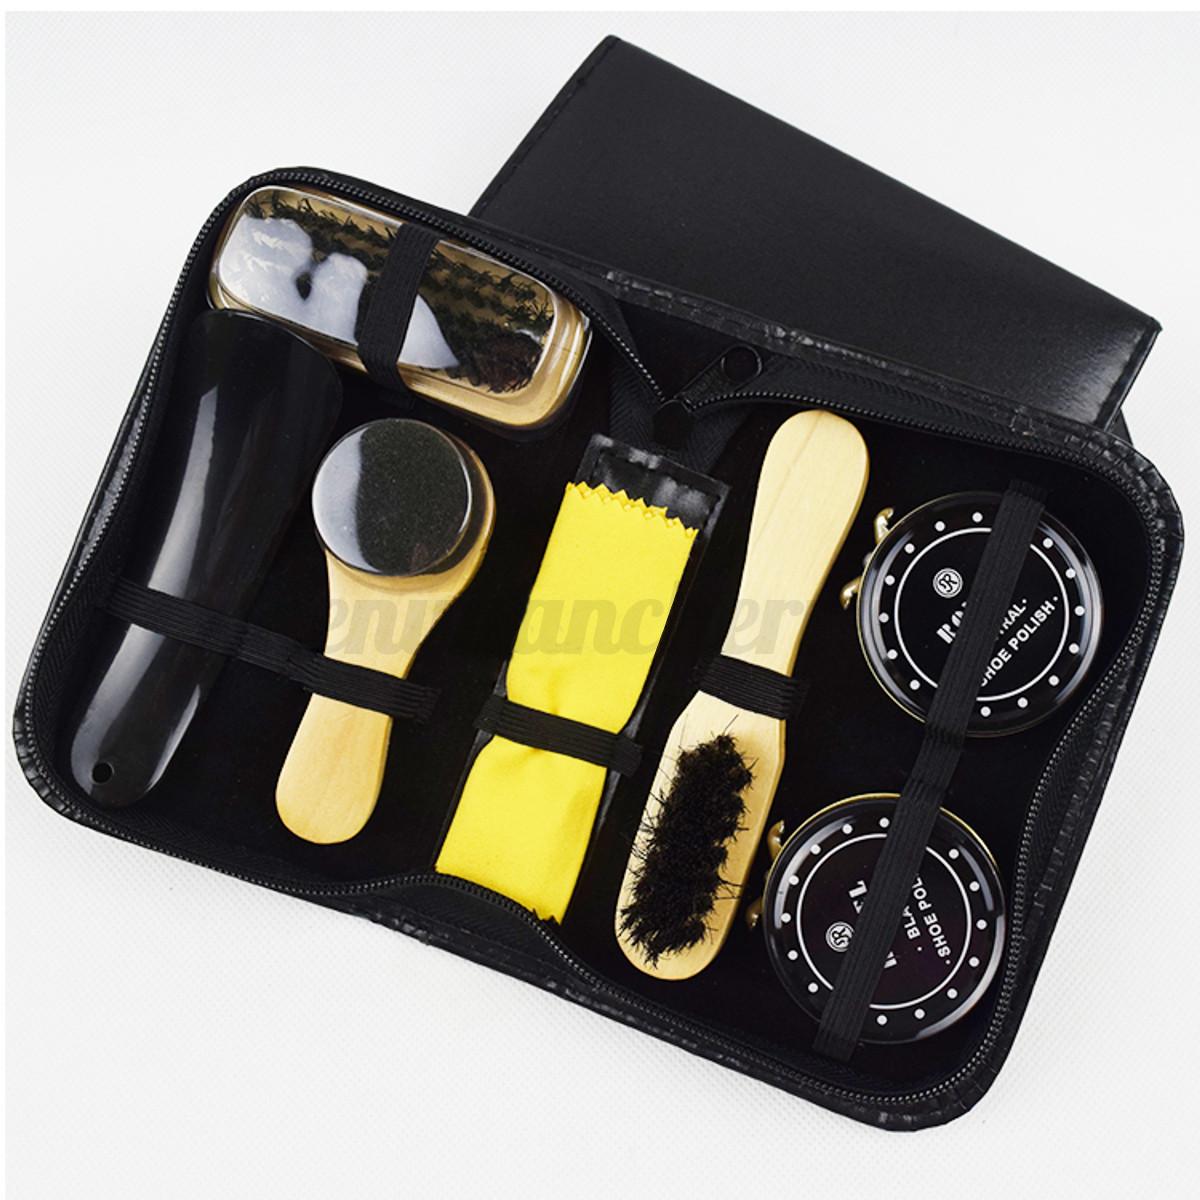 shine shoe polish Kiwi instant black shoe polish colour shine 75ml x 2 bottles: amazoncouk: kitchen & home.